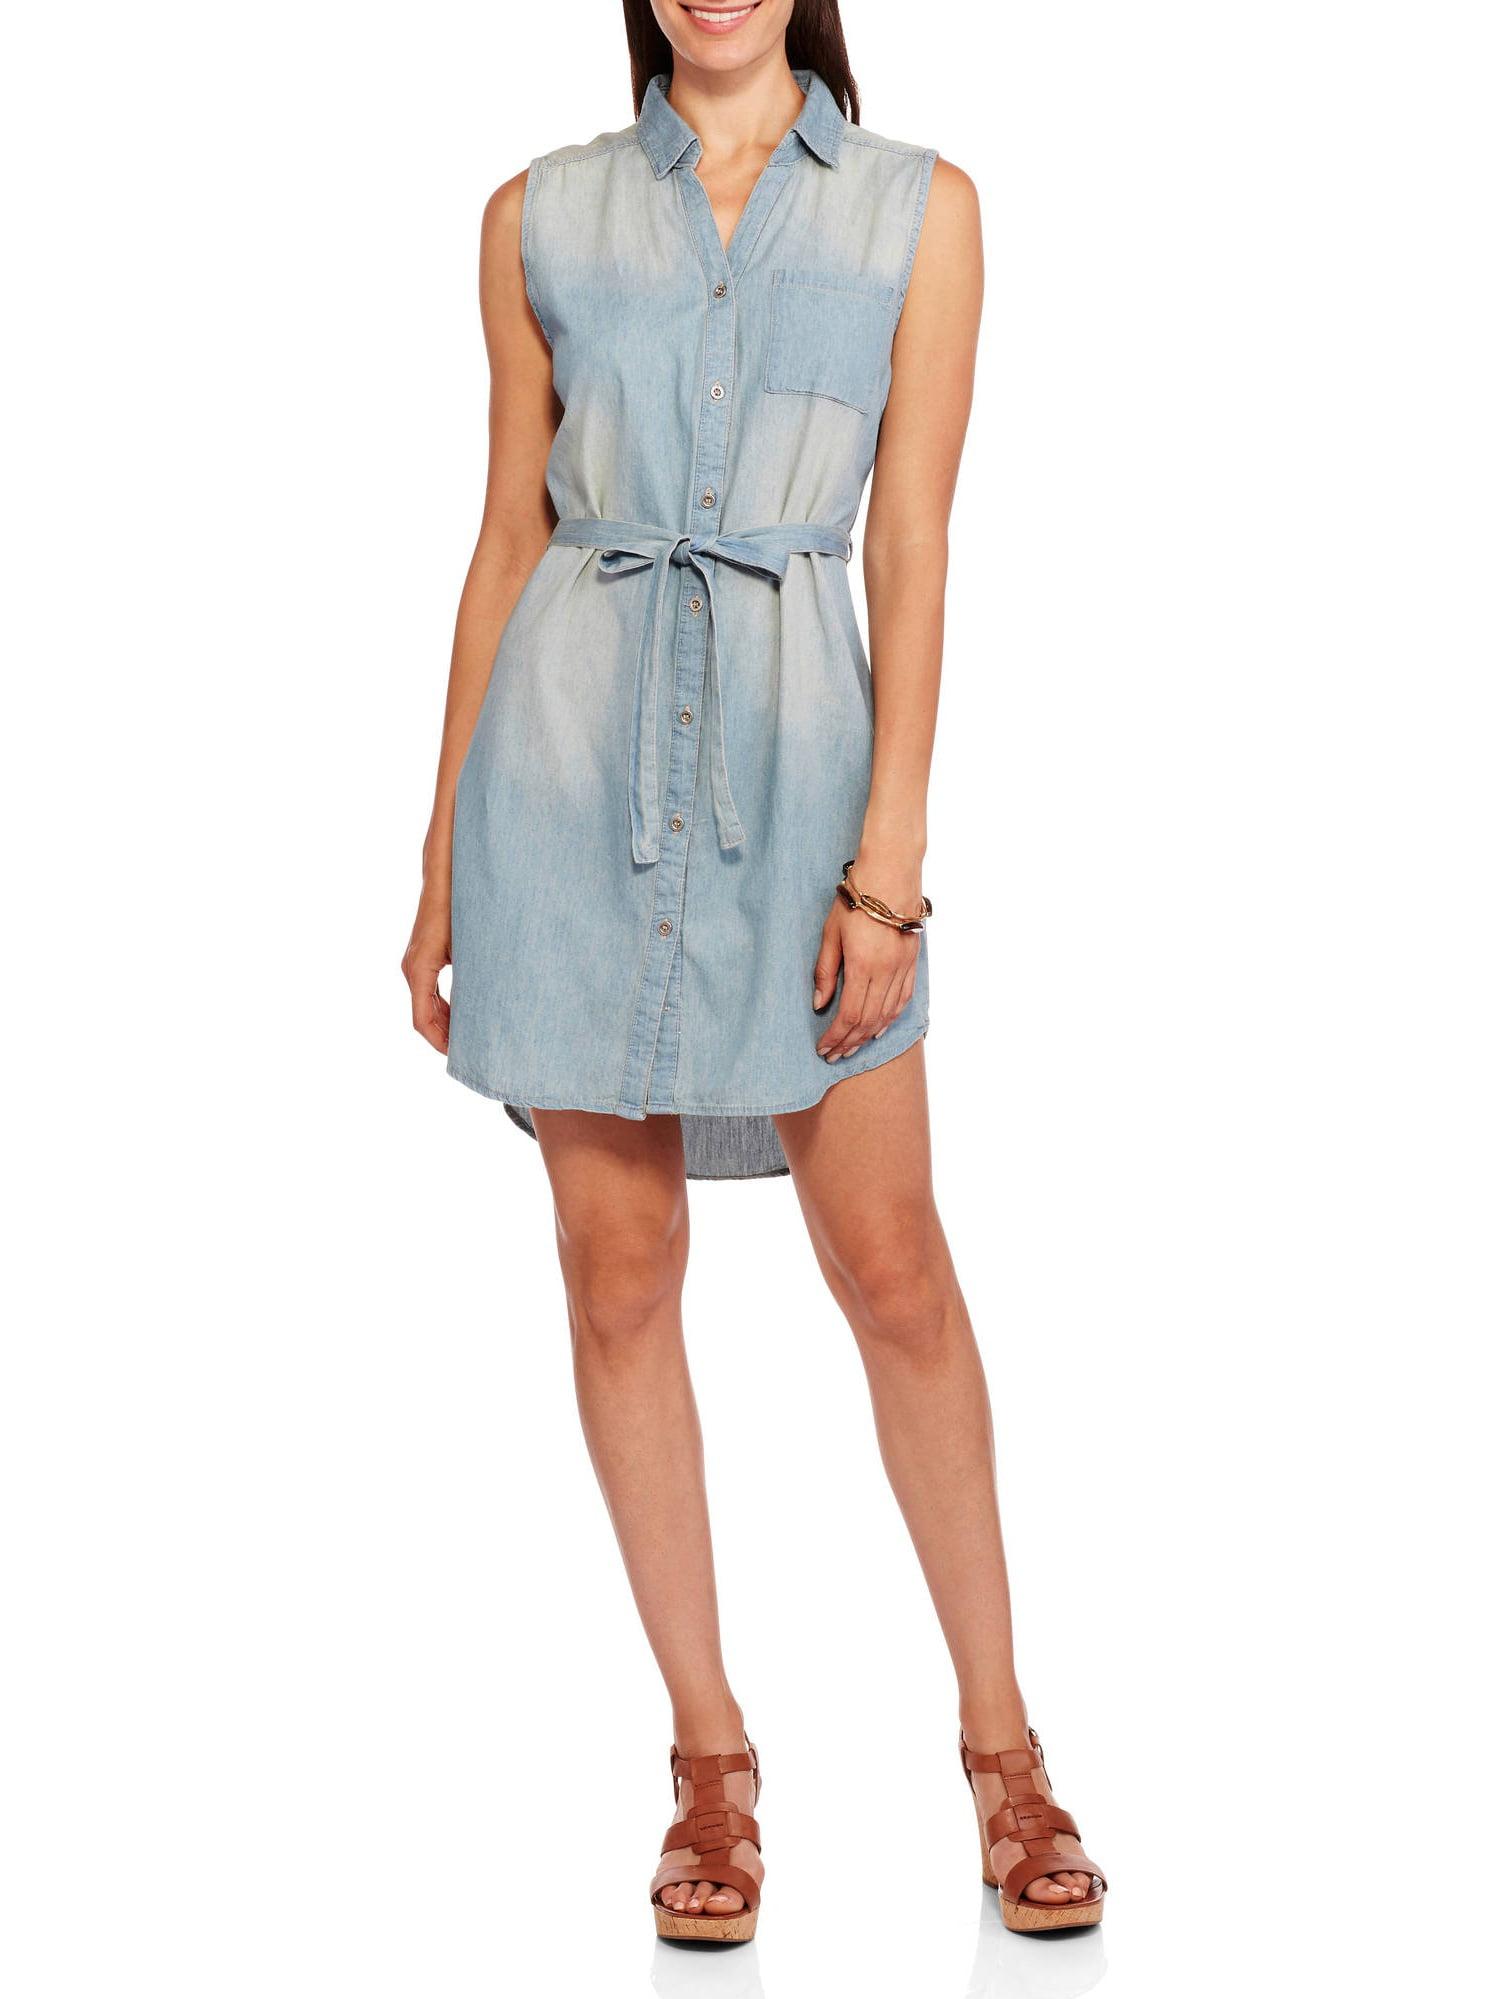 Brooke Leigh Womens Self Tie Sleeveless Chambray Shirt Dress